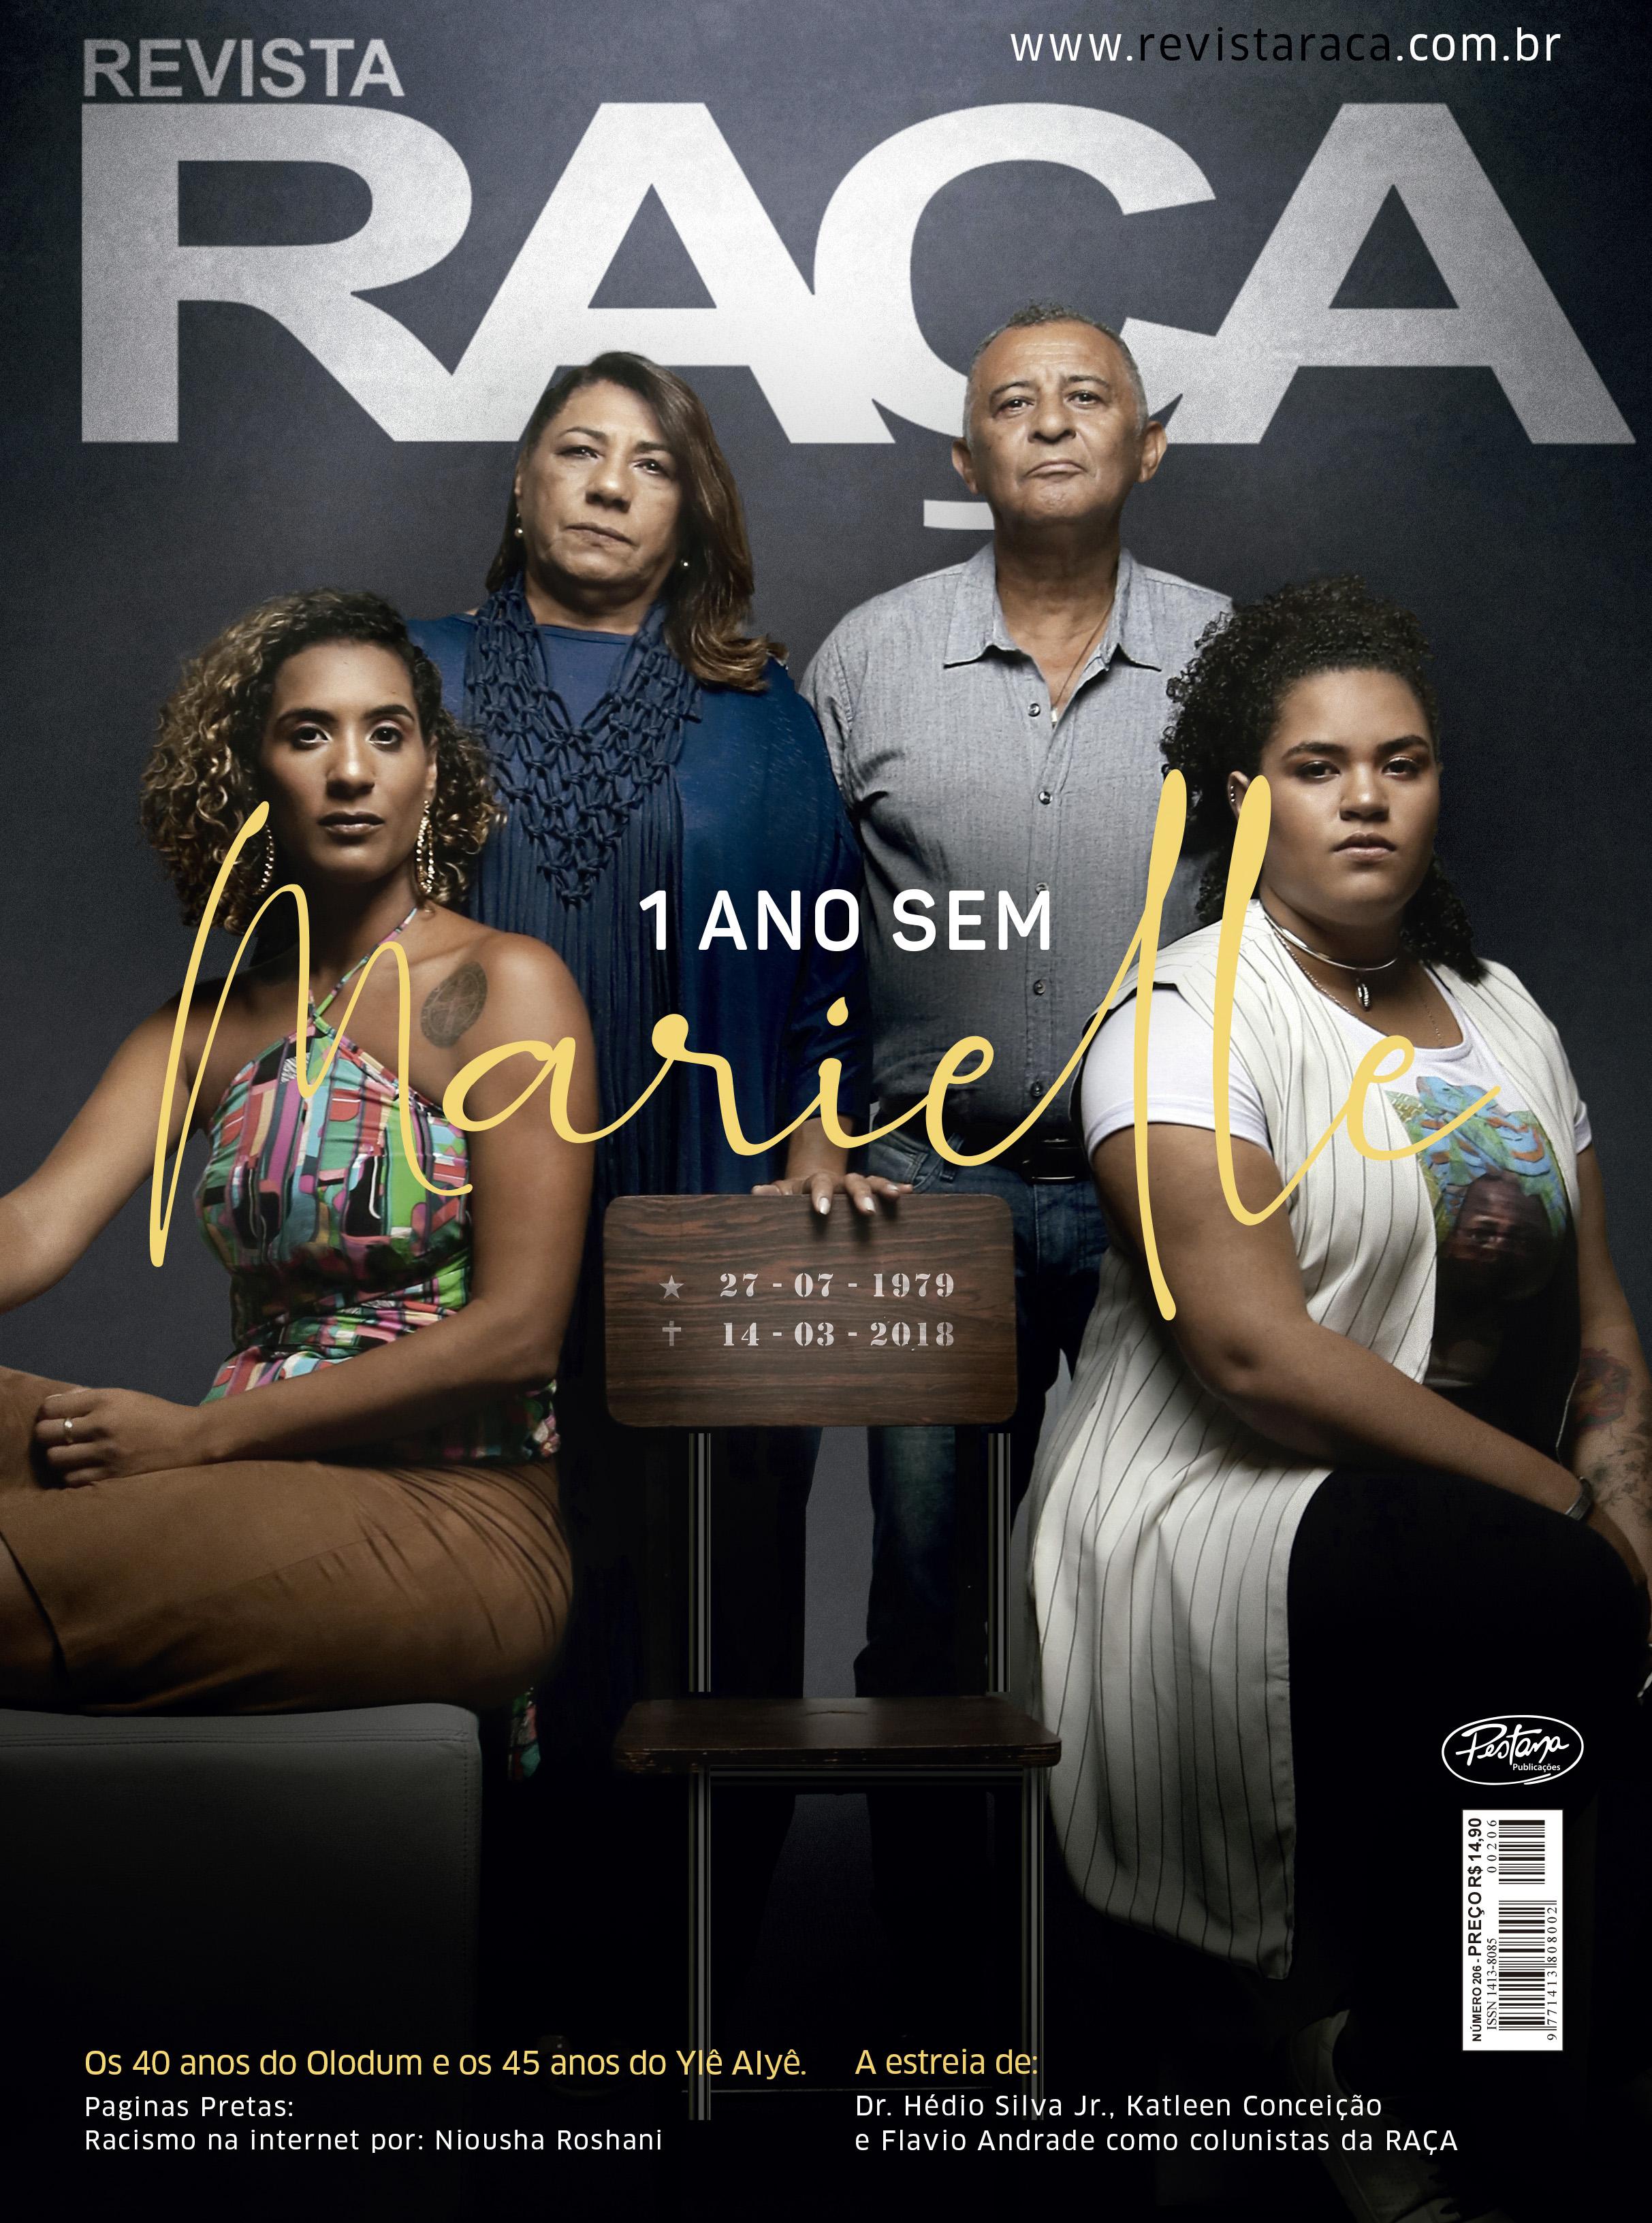 https://revistaraca.com.br/wp-content/uploads/2019/03/capa-marielle.jpg